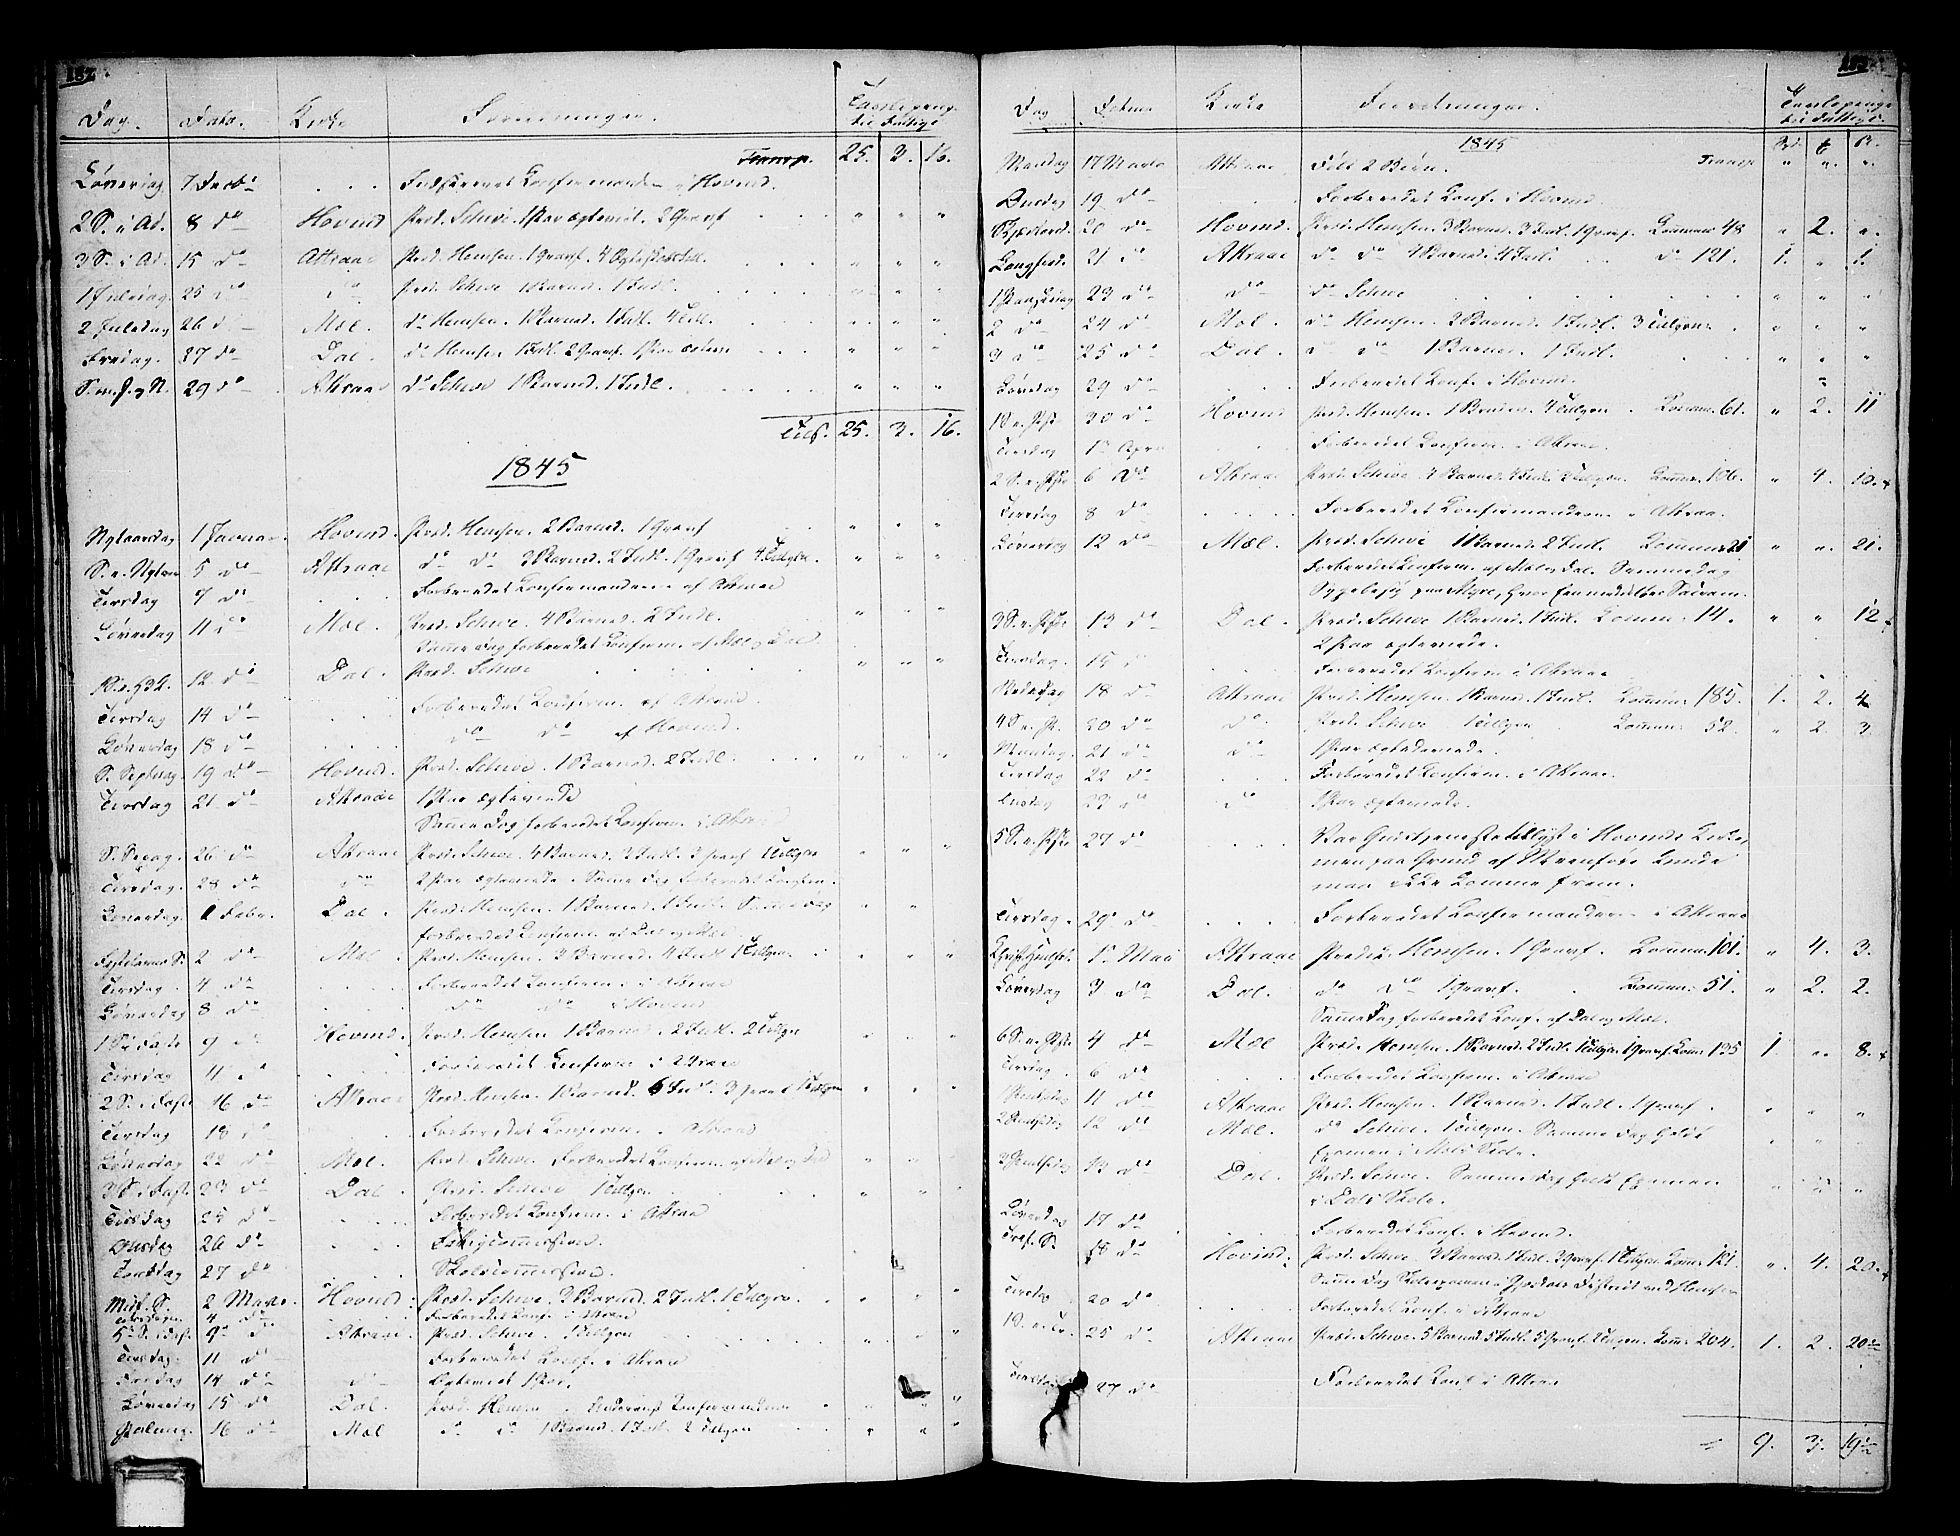 SAKO, Tinn kirkebøker, F/Fa/L0003: Ministerialbok nr. I 3, 1810-1814, s. 182-183